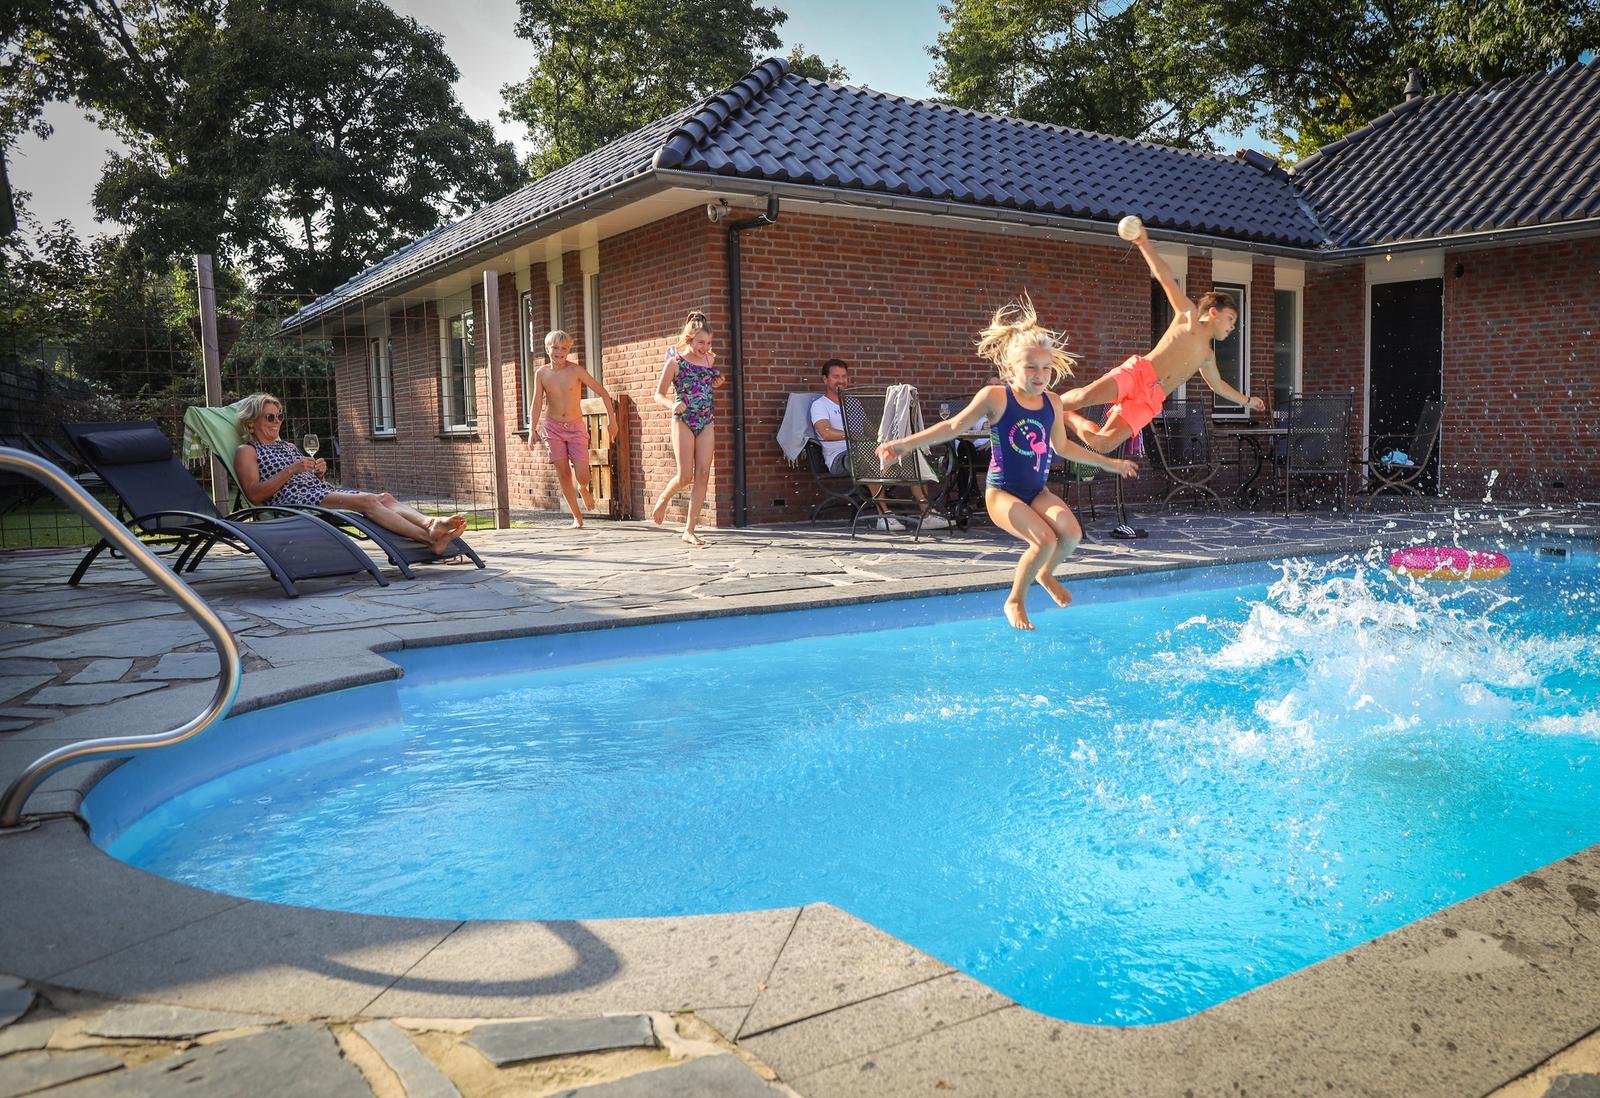 18-person spa bungalow